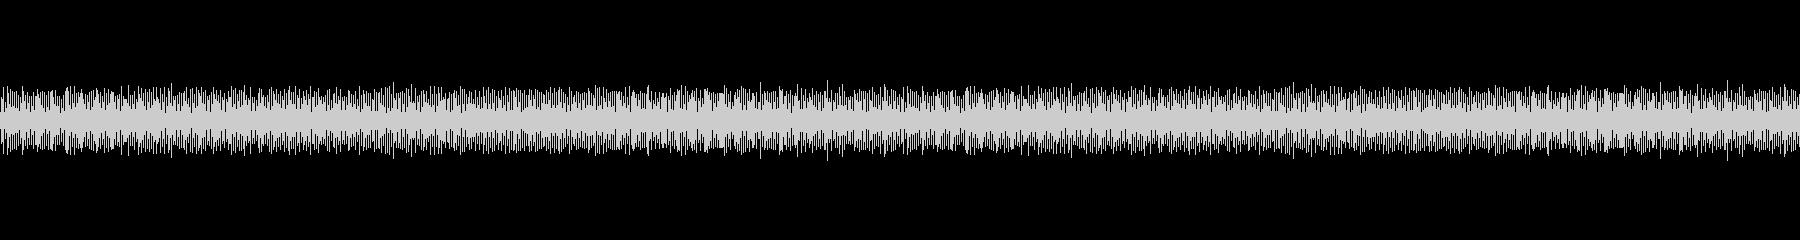 ASMR 音フェチApp用 ノイズ 2の未再生の波形